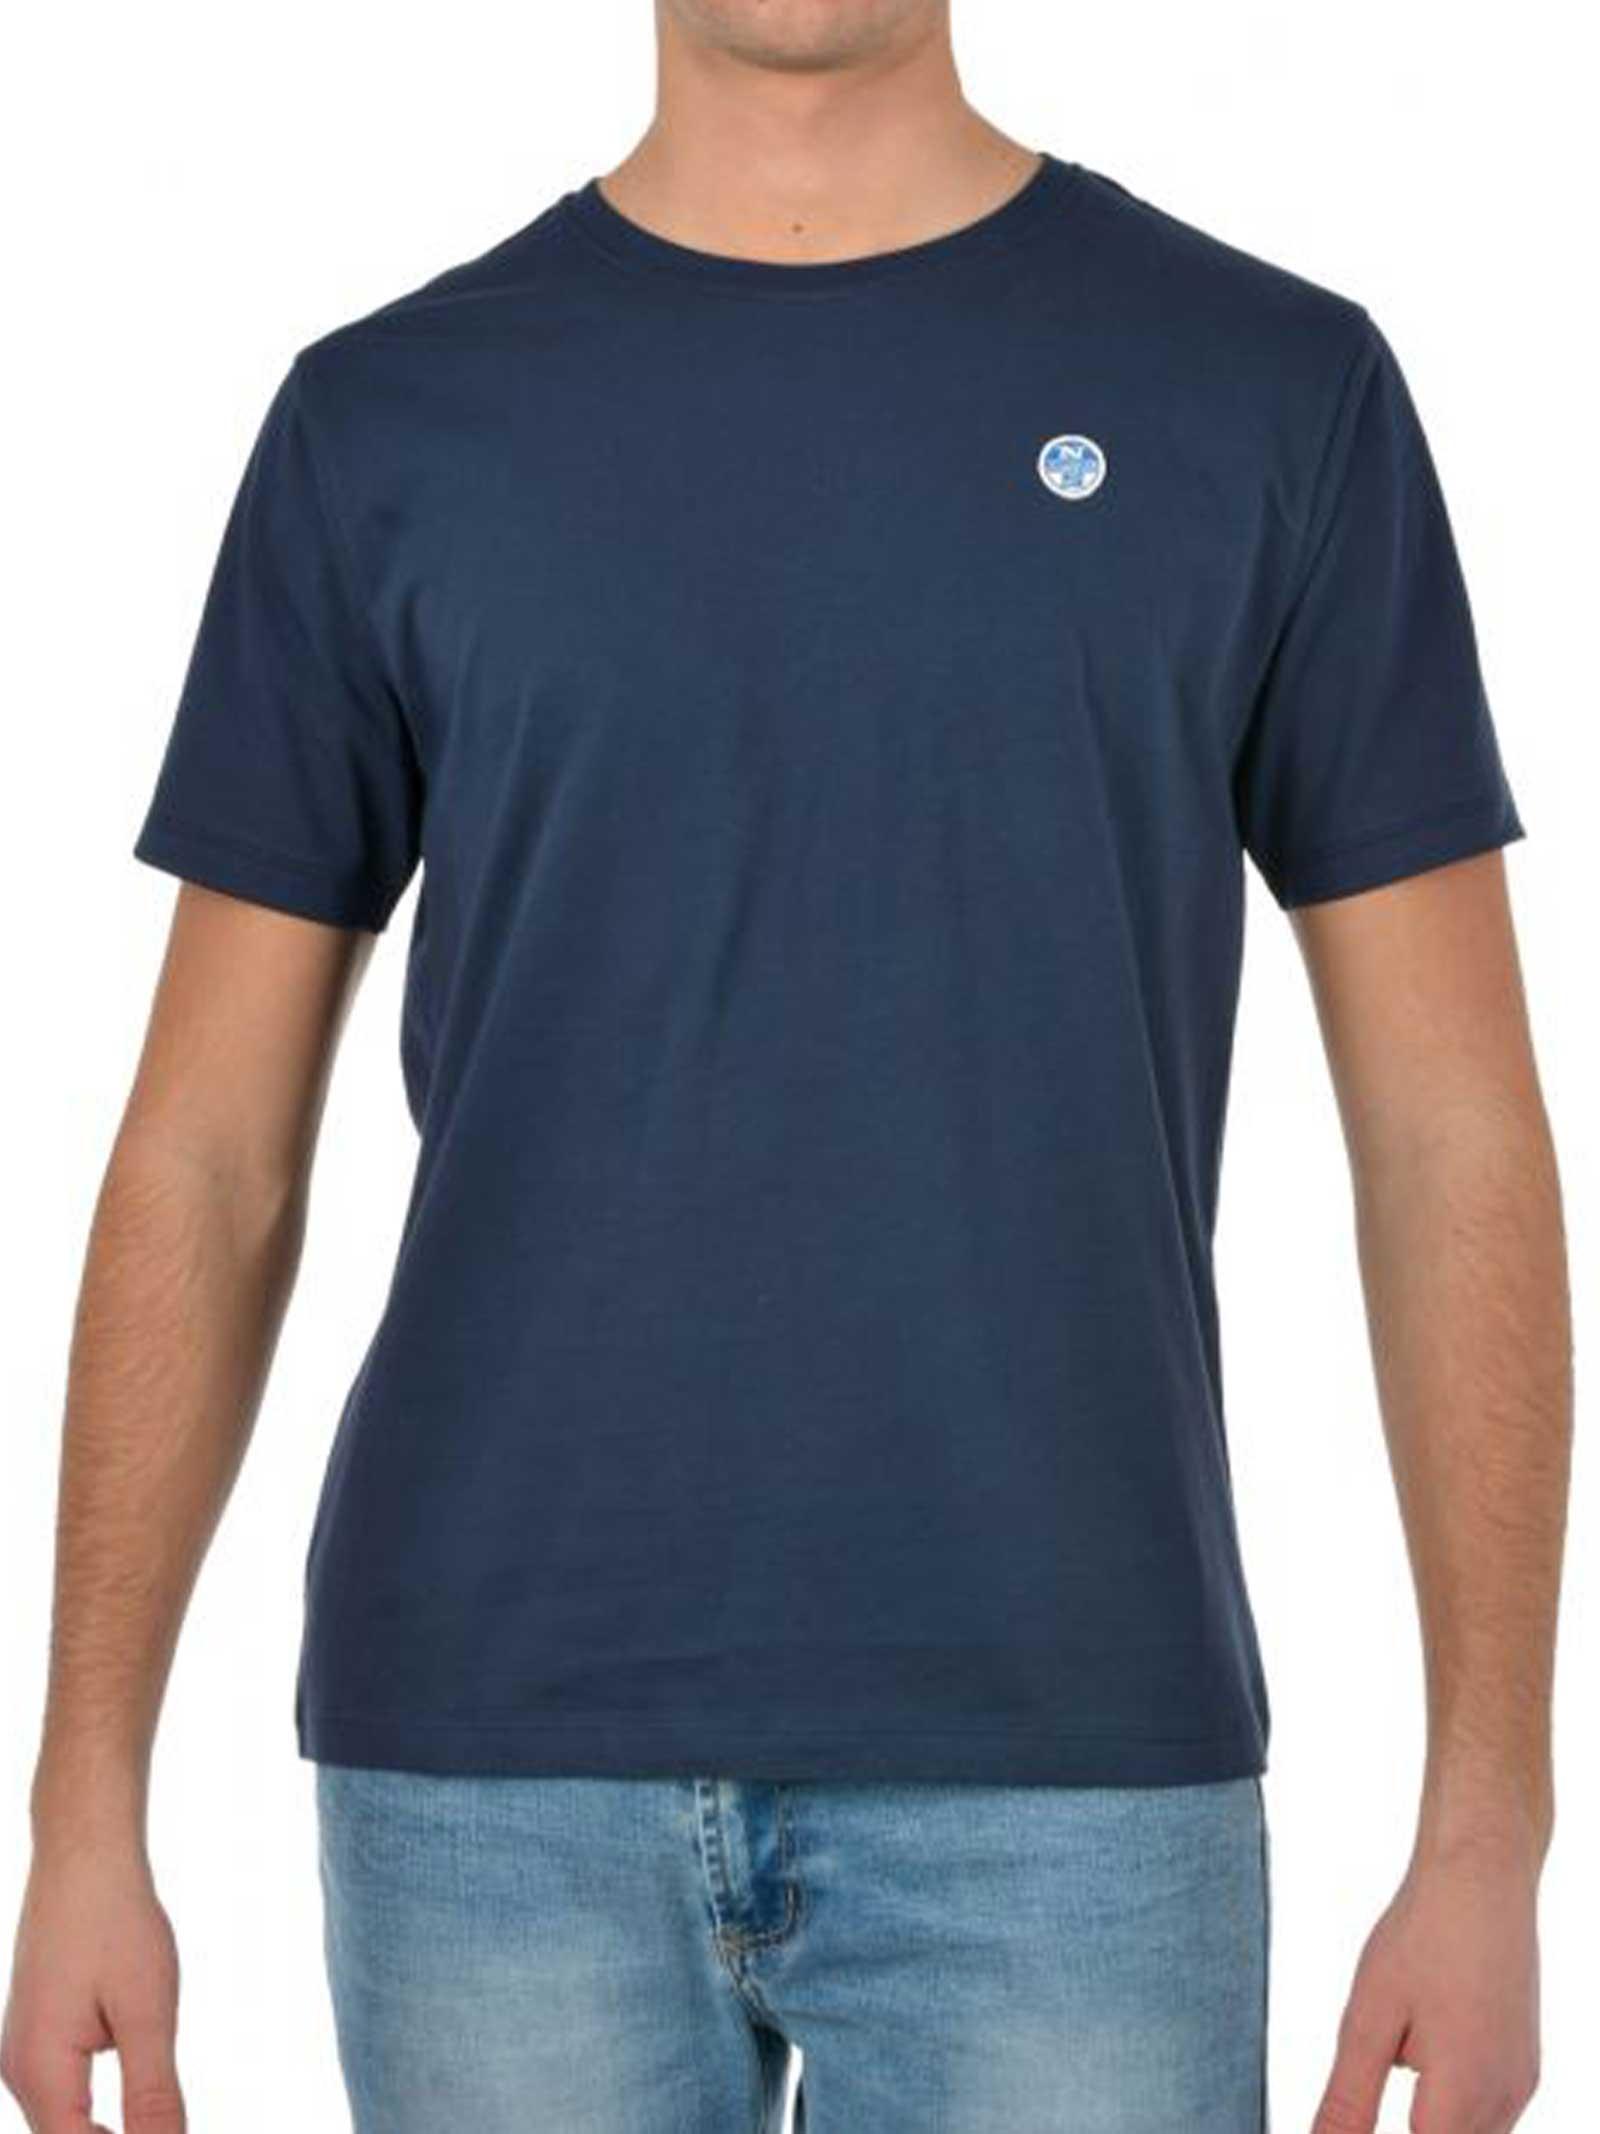 T-SHIRT UOMO NORTH SAILS   T-shirt   6925300802